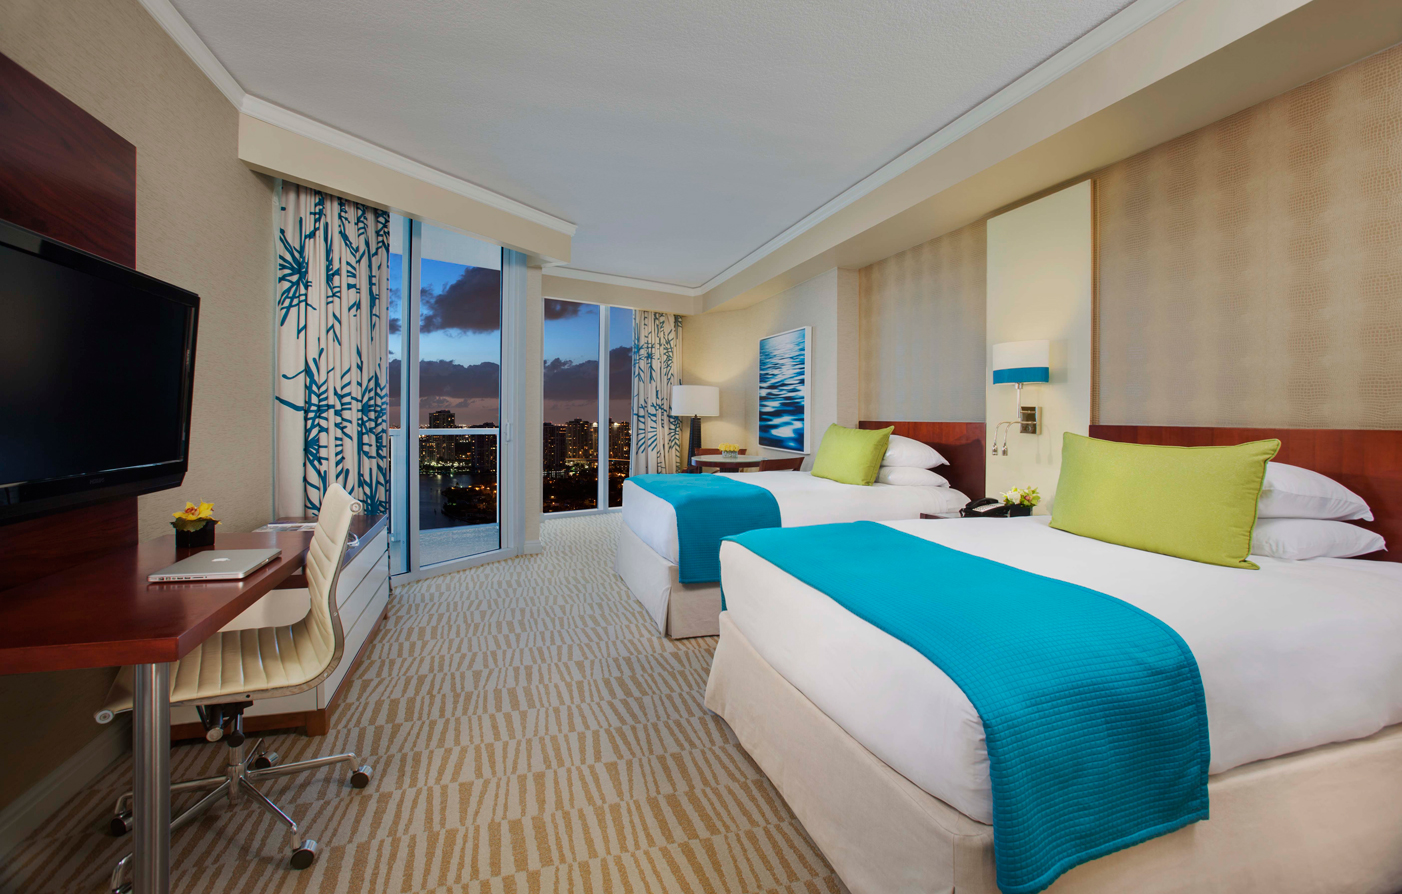 Trump International Hotel Rooms Interior